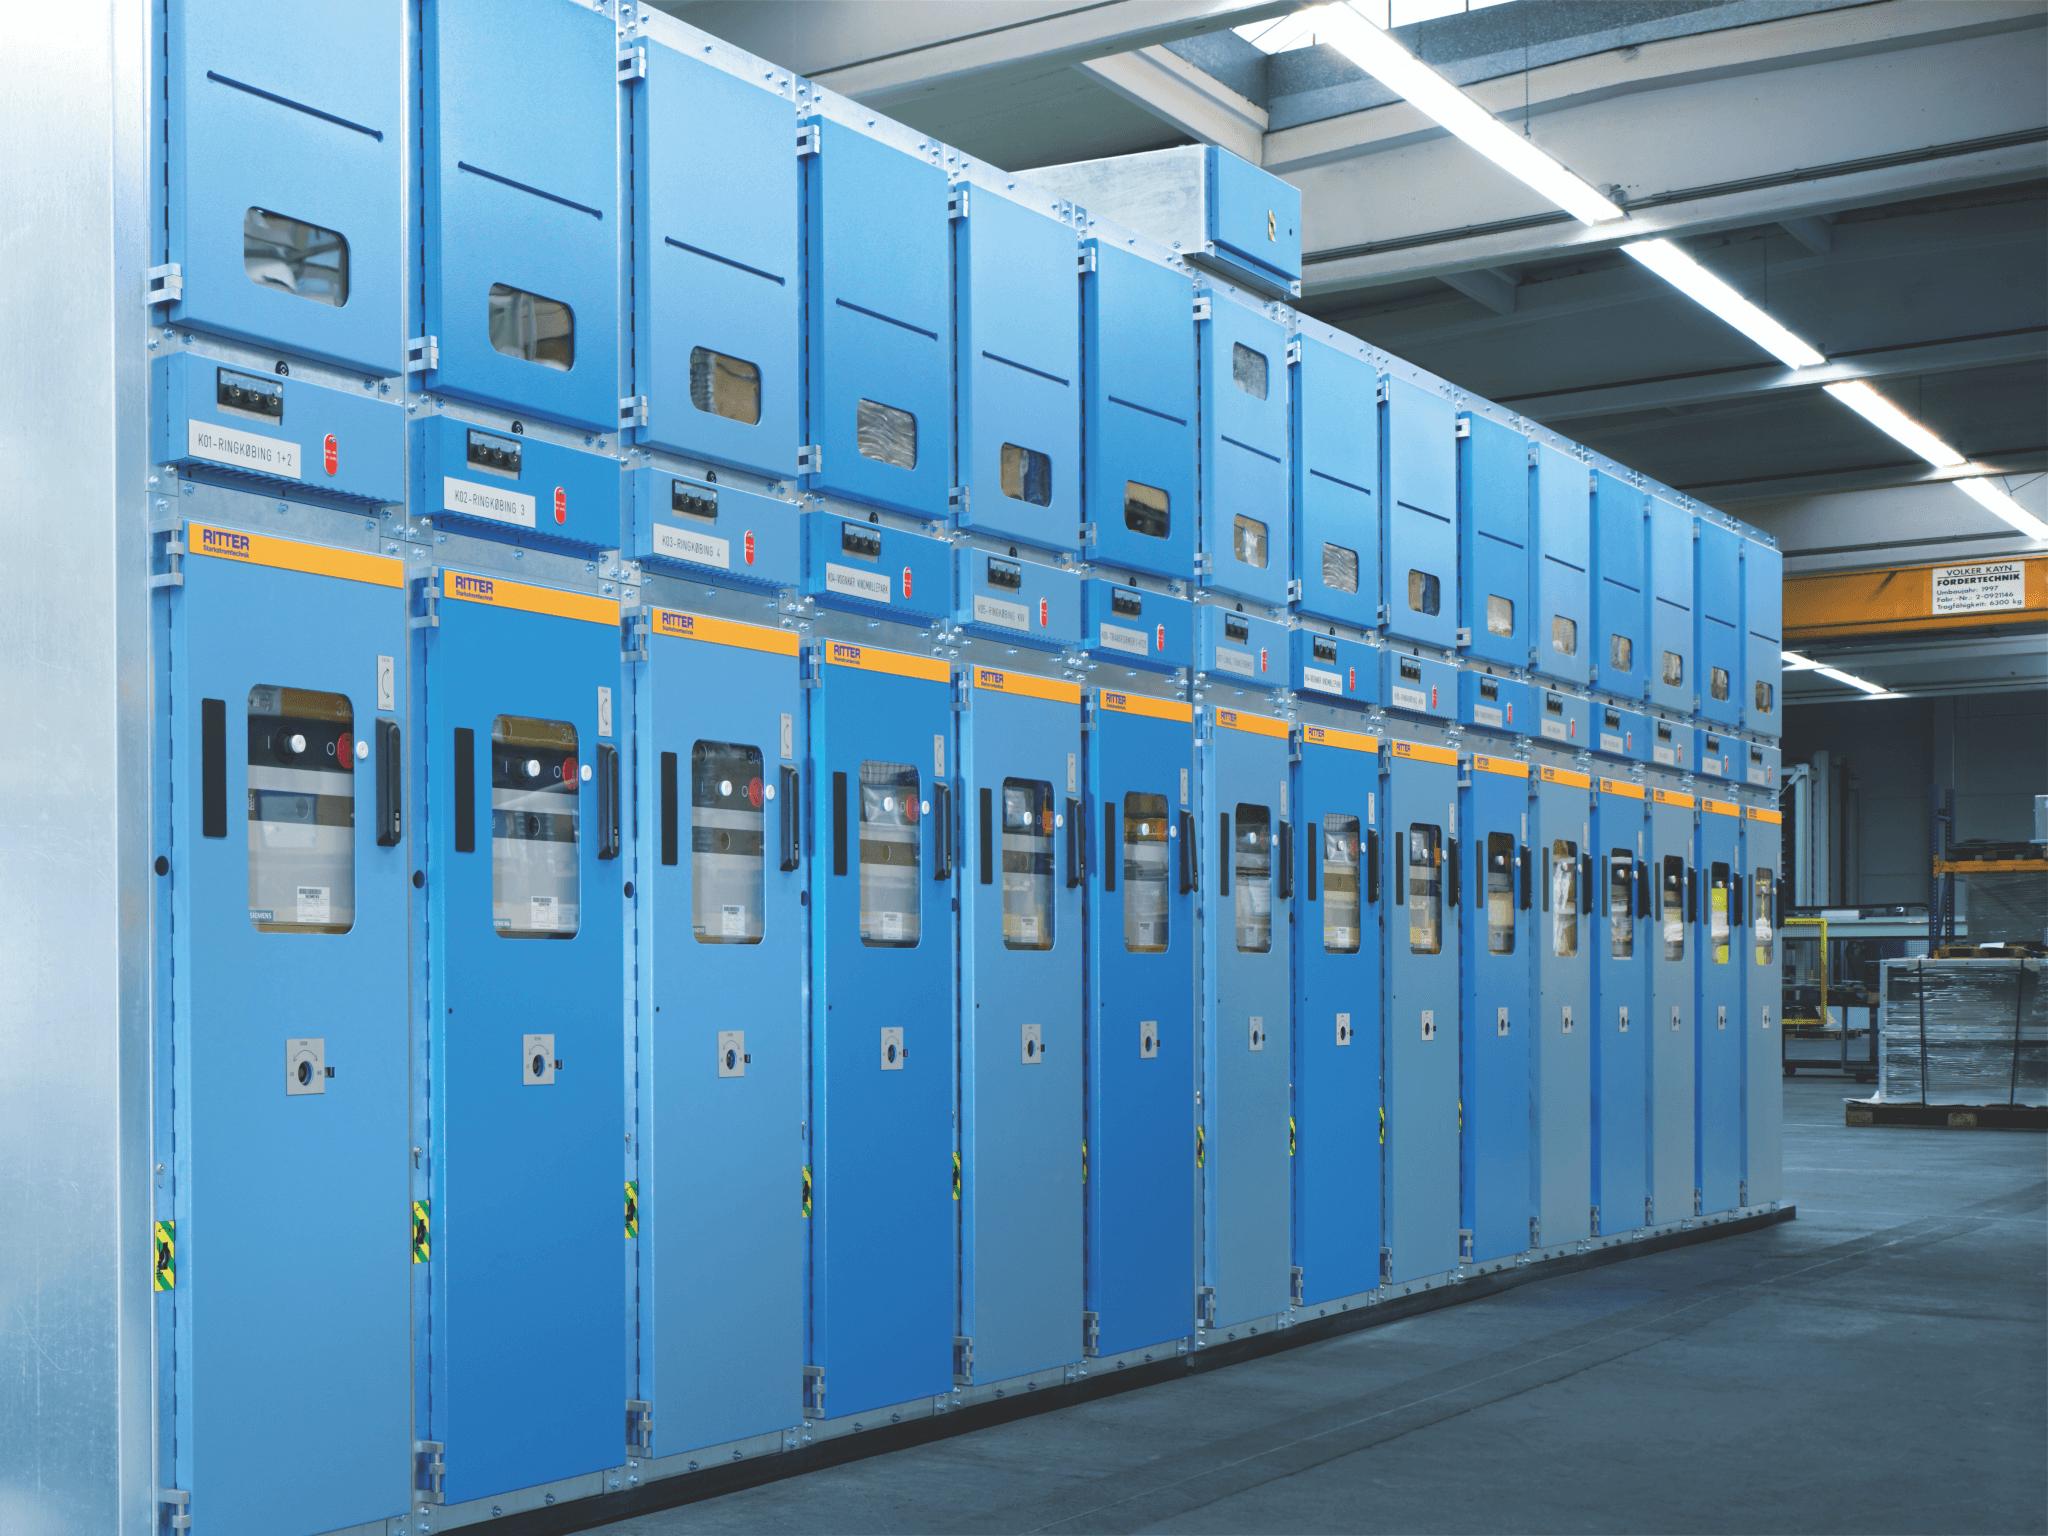 Switchgear for AC Power Networks